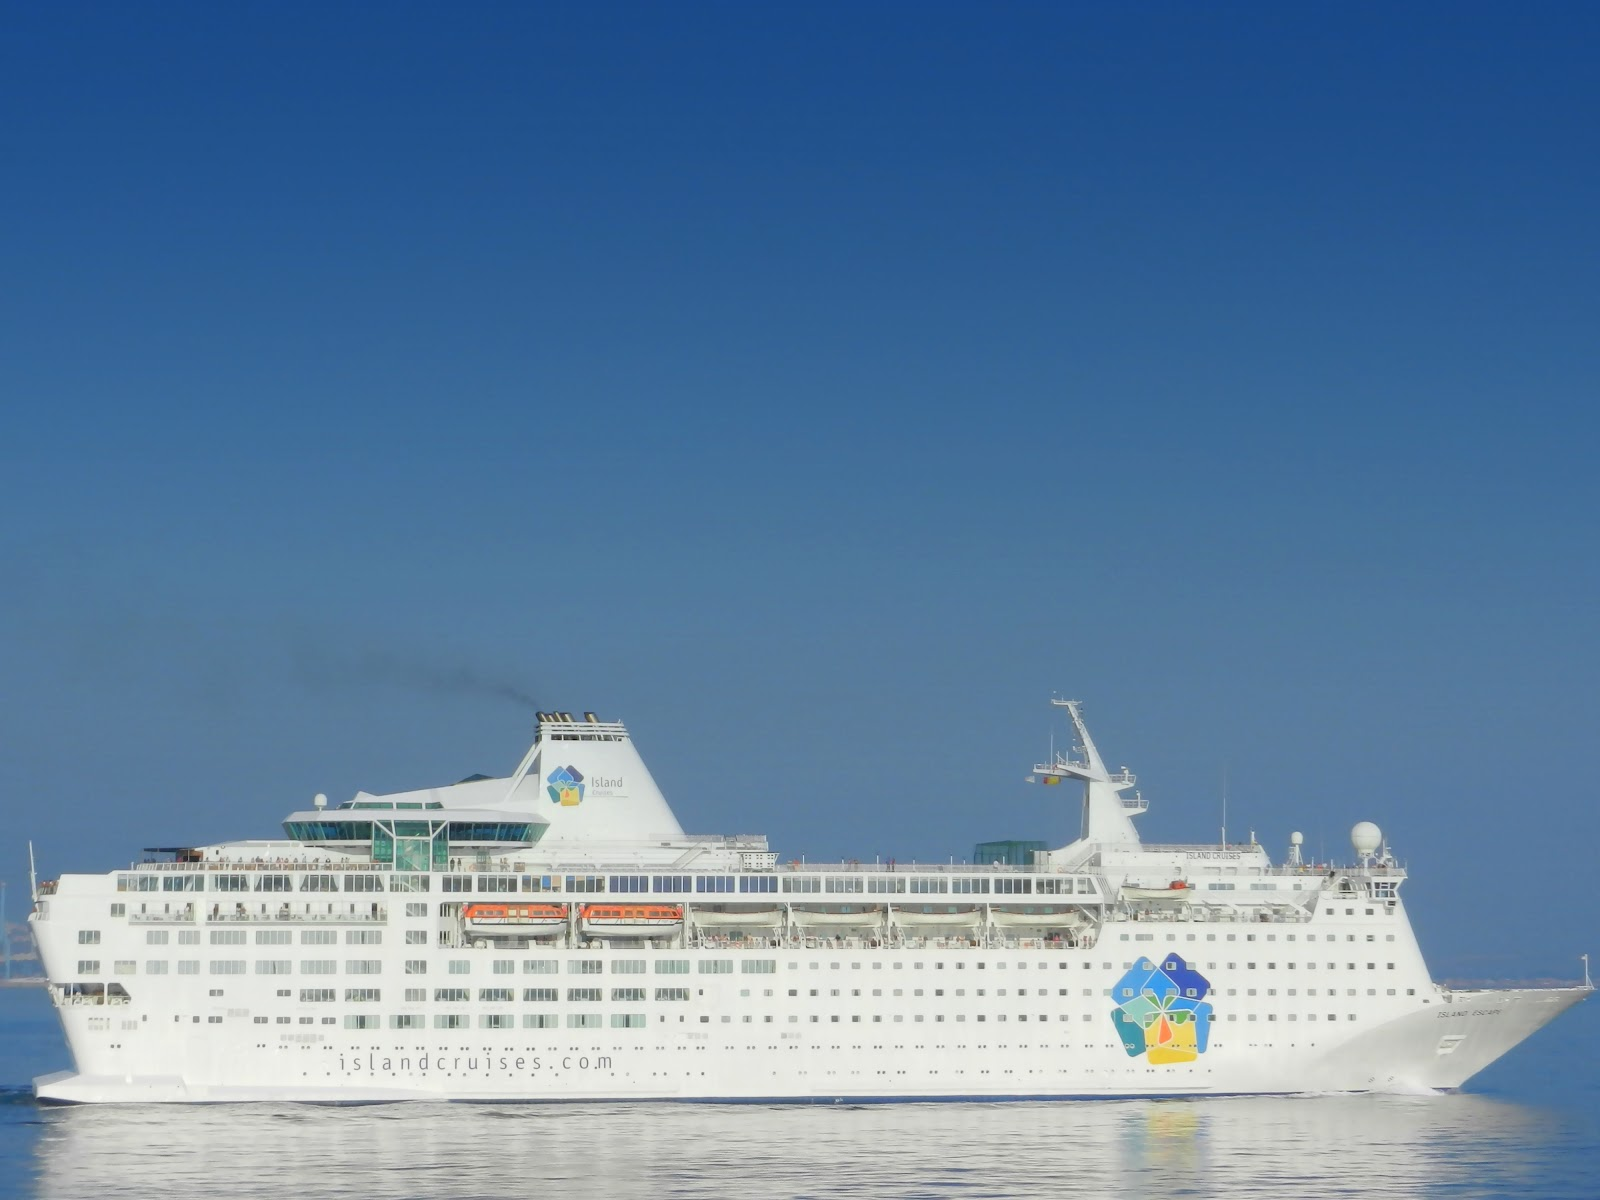 Ship's Images: Passenger Ships